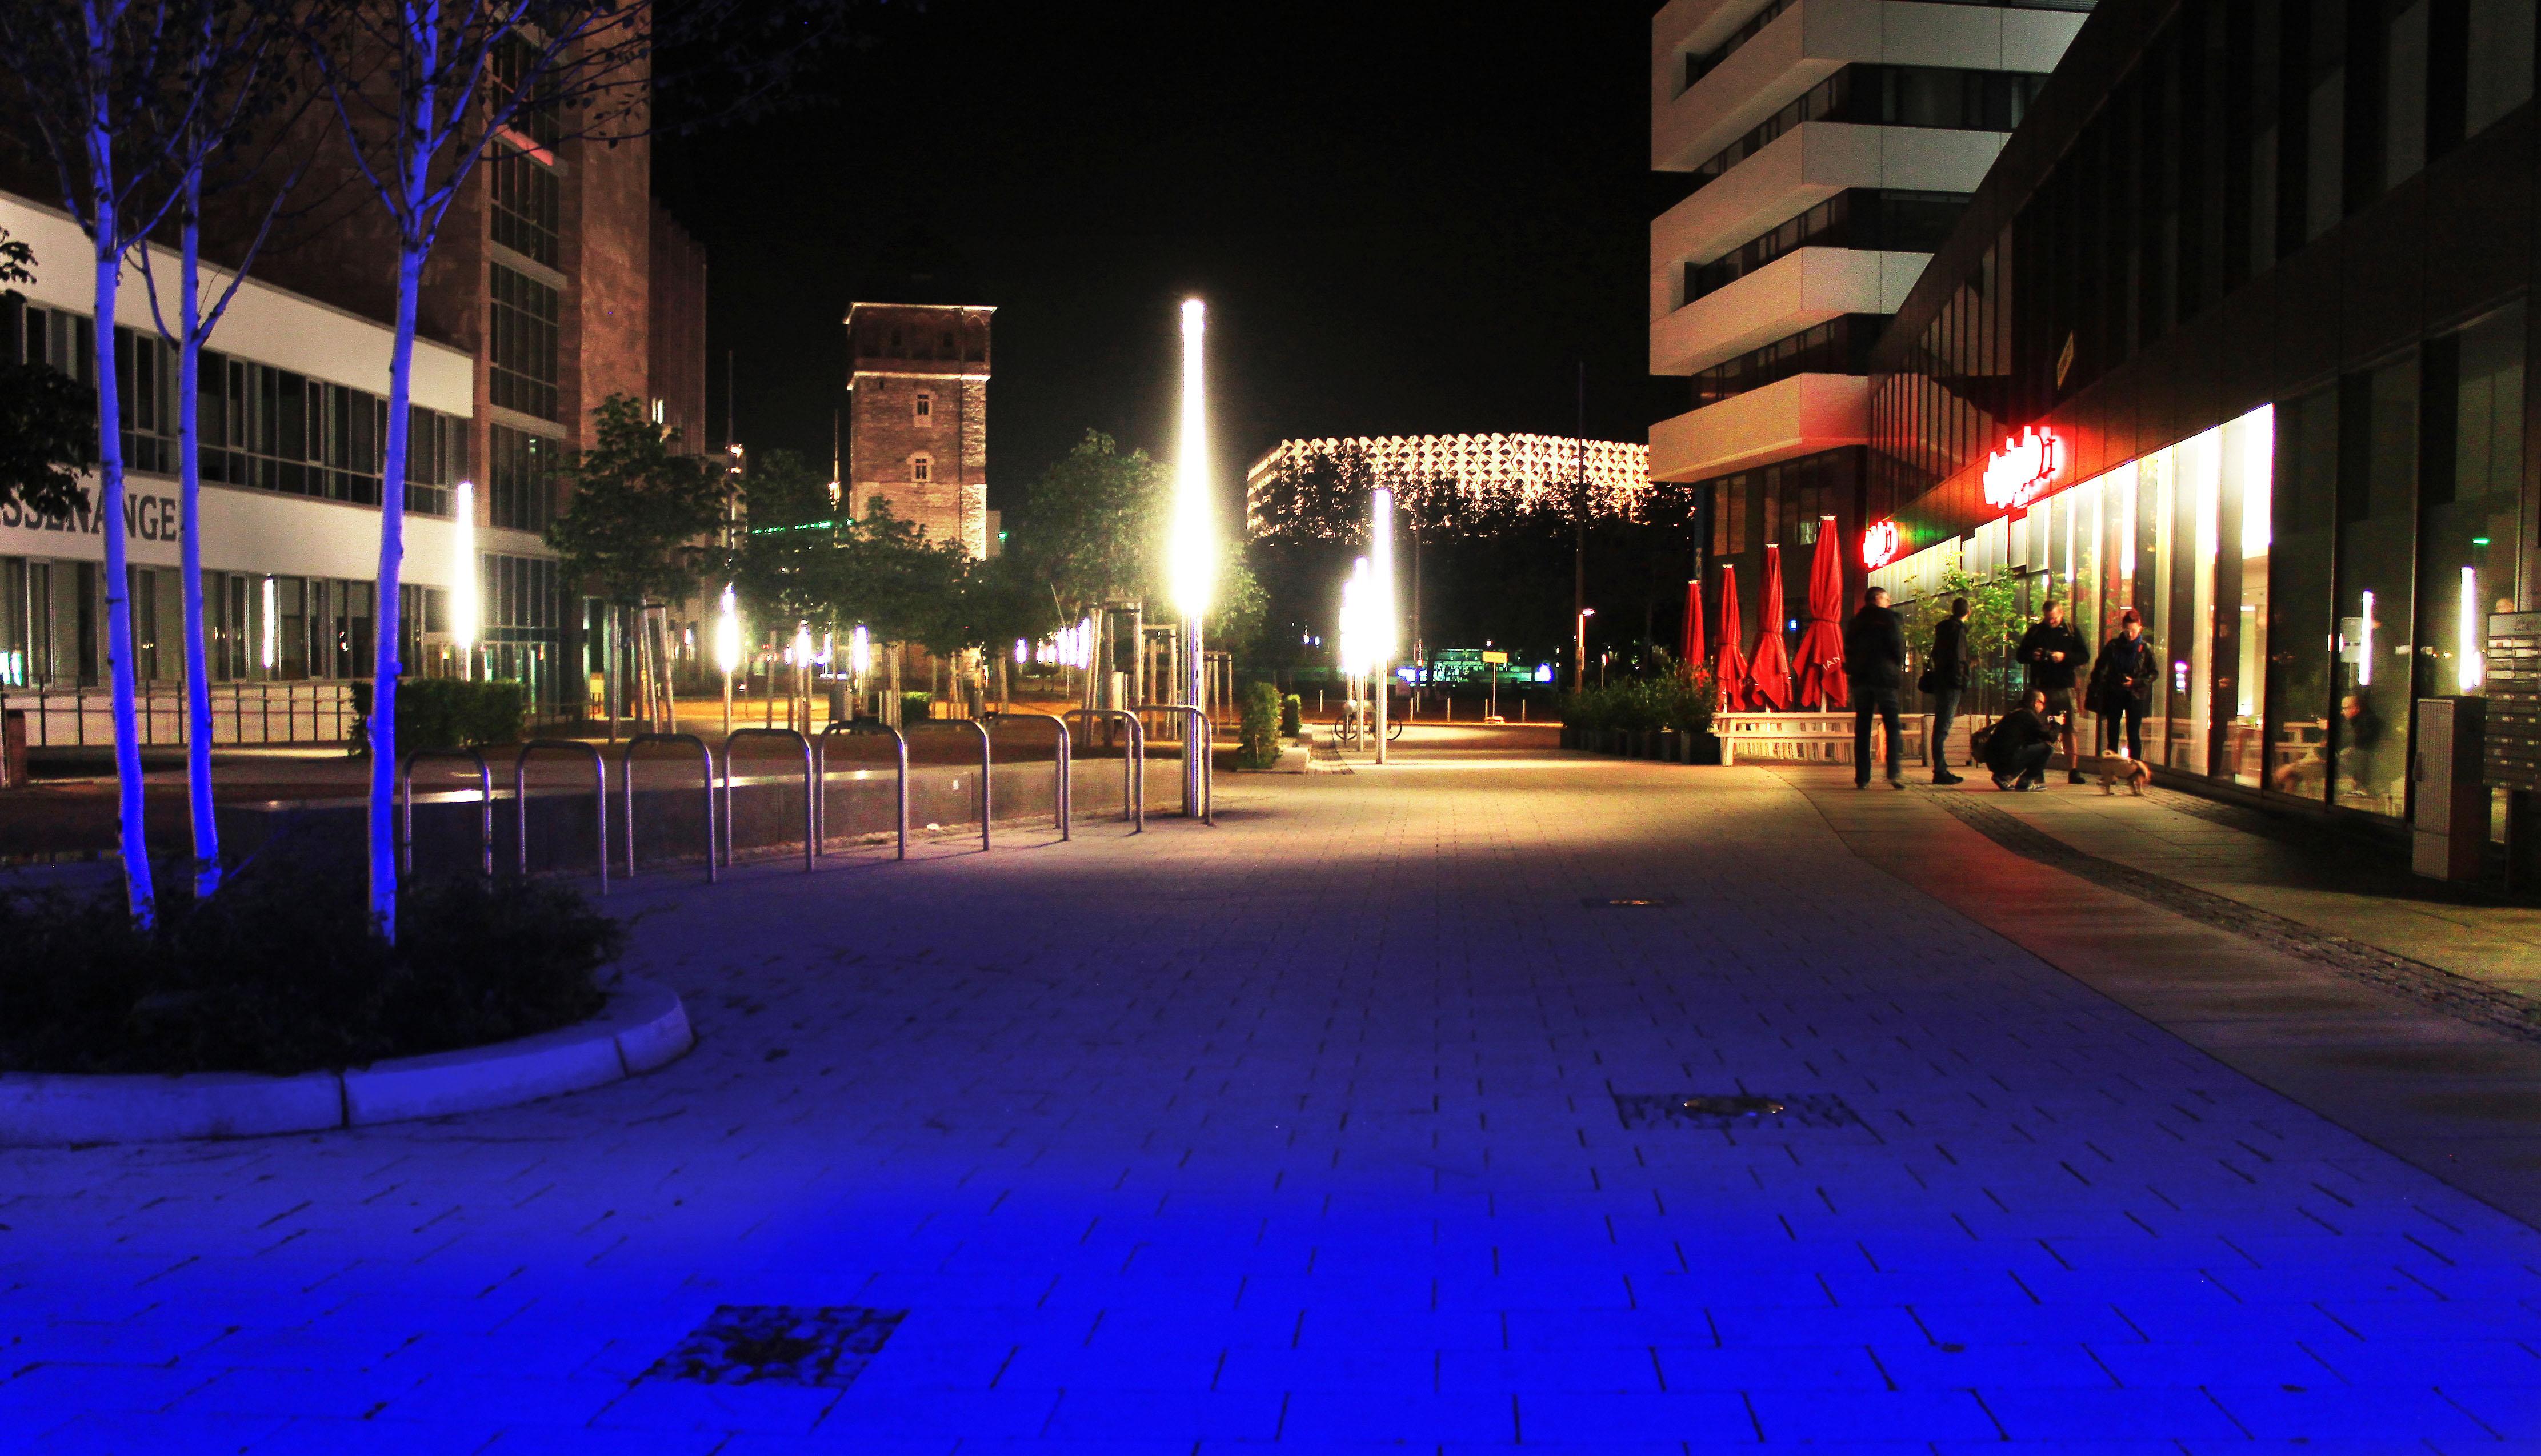 file blau ist die nacht 9495990611 jpg wikimedia commons. Black Bedroom Furniture Sets. Home Design Ideas